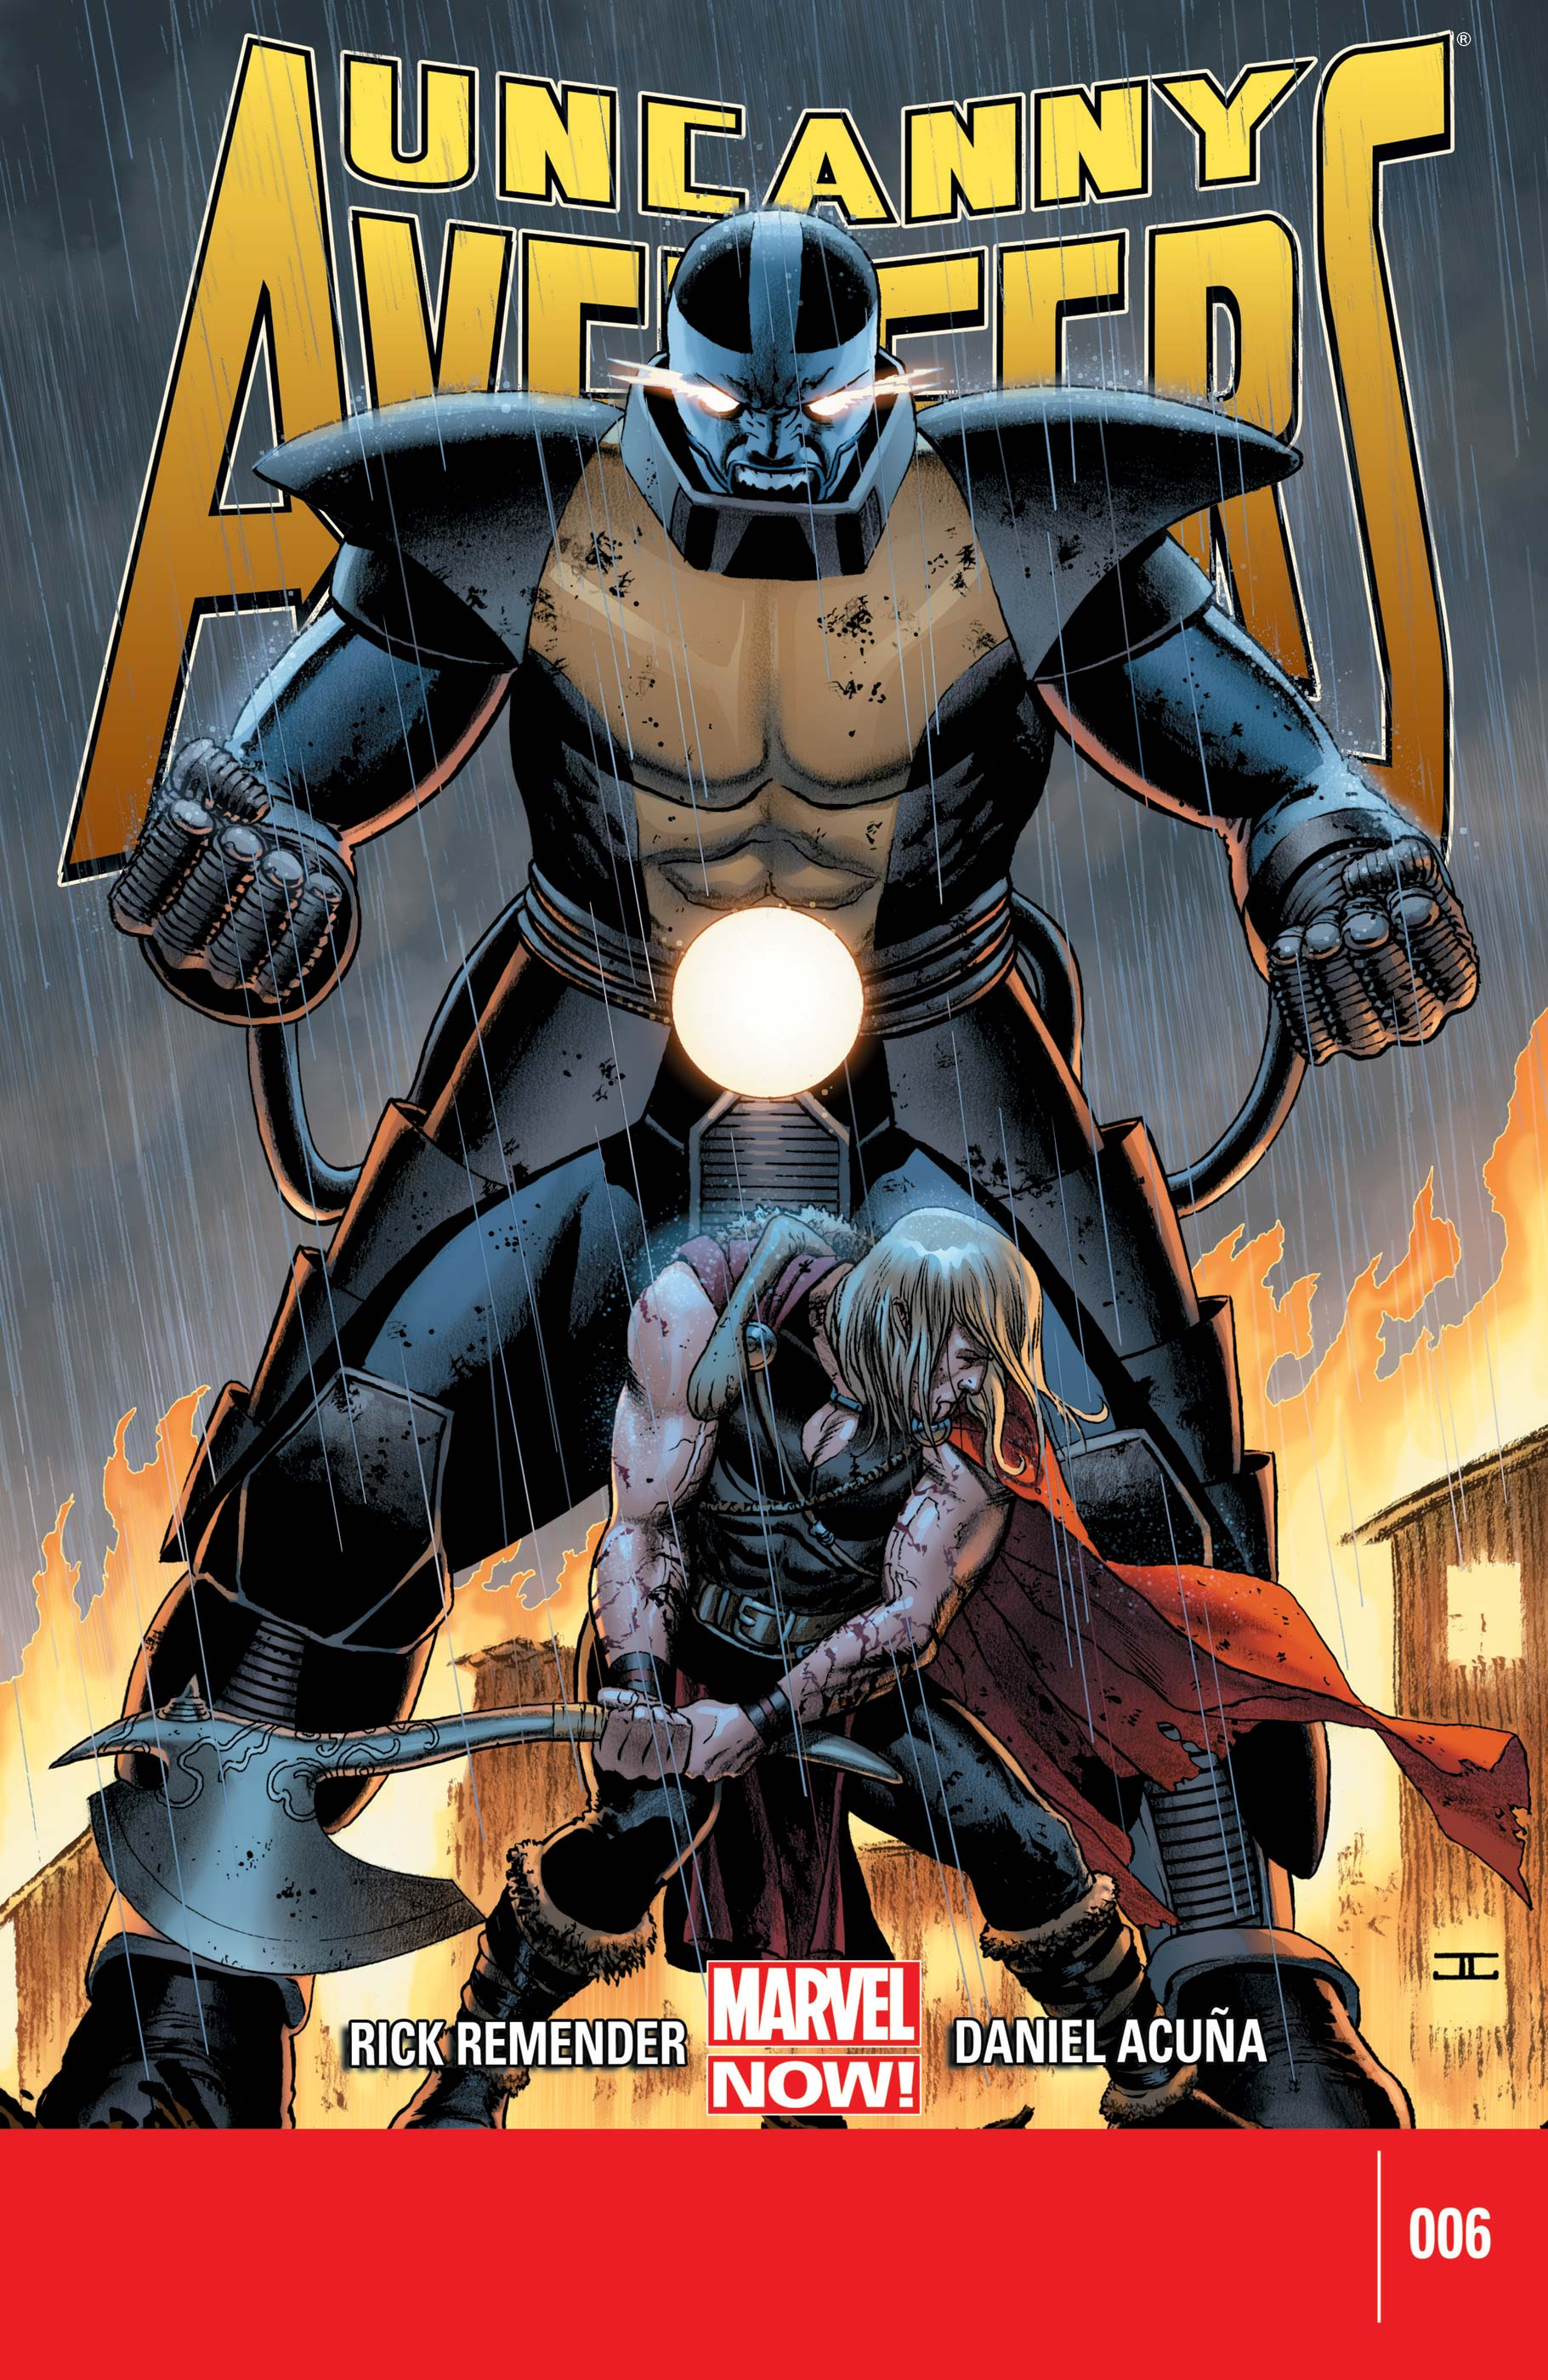 Uncanny Avengers (2012) #6